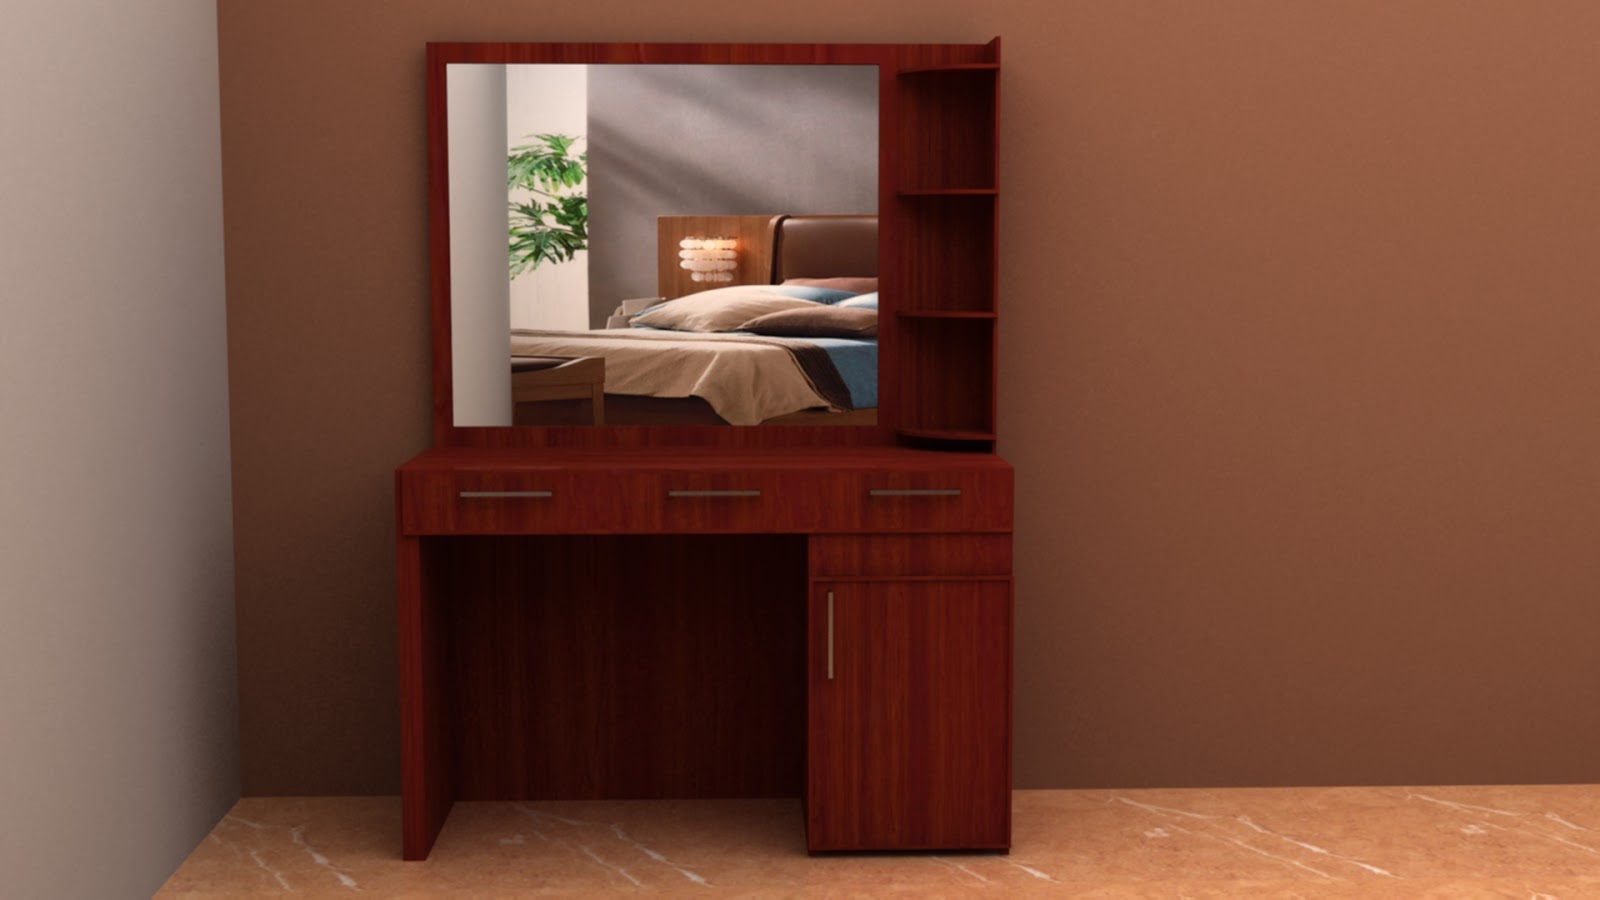 Living Room Cupboards Designs Cupboards Designs